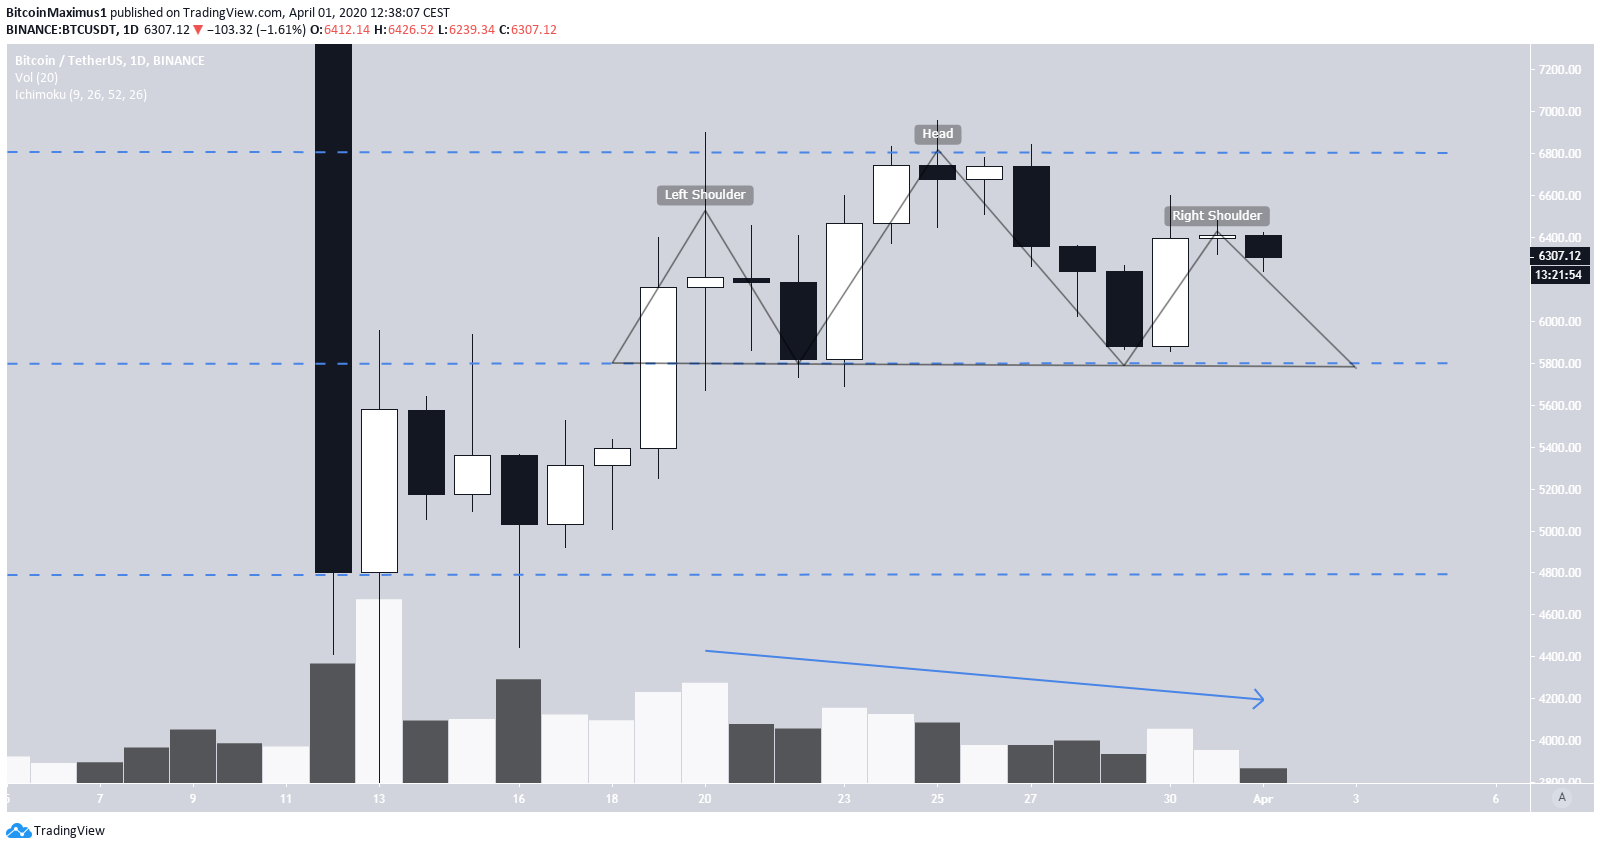 Bitcoin Trading Range